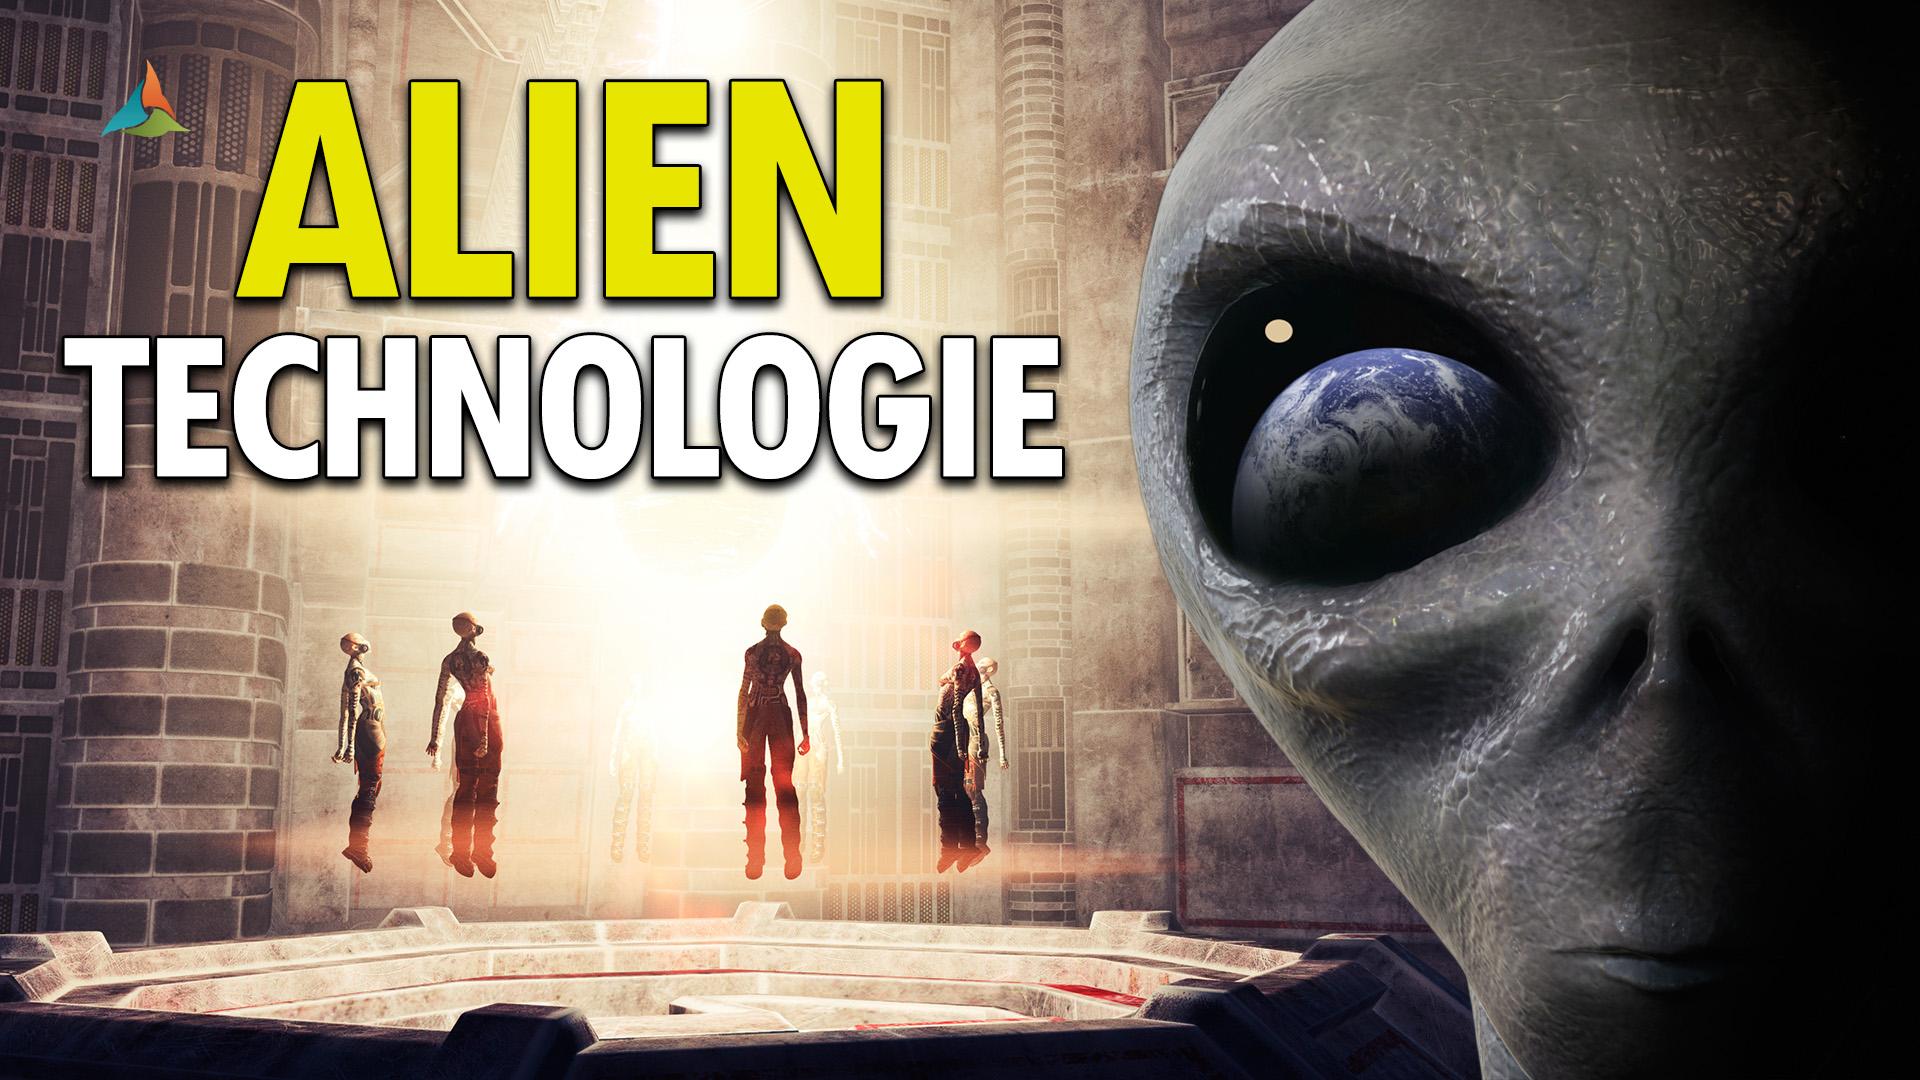 Alien-Technologie: Was Entführte berichten - Exomagazin.tv